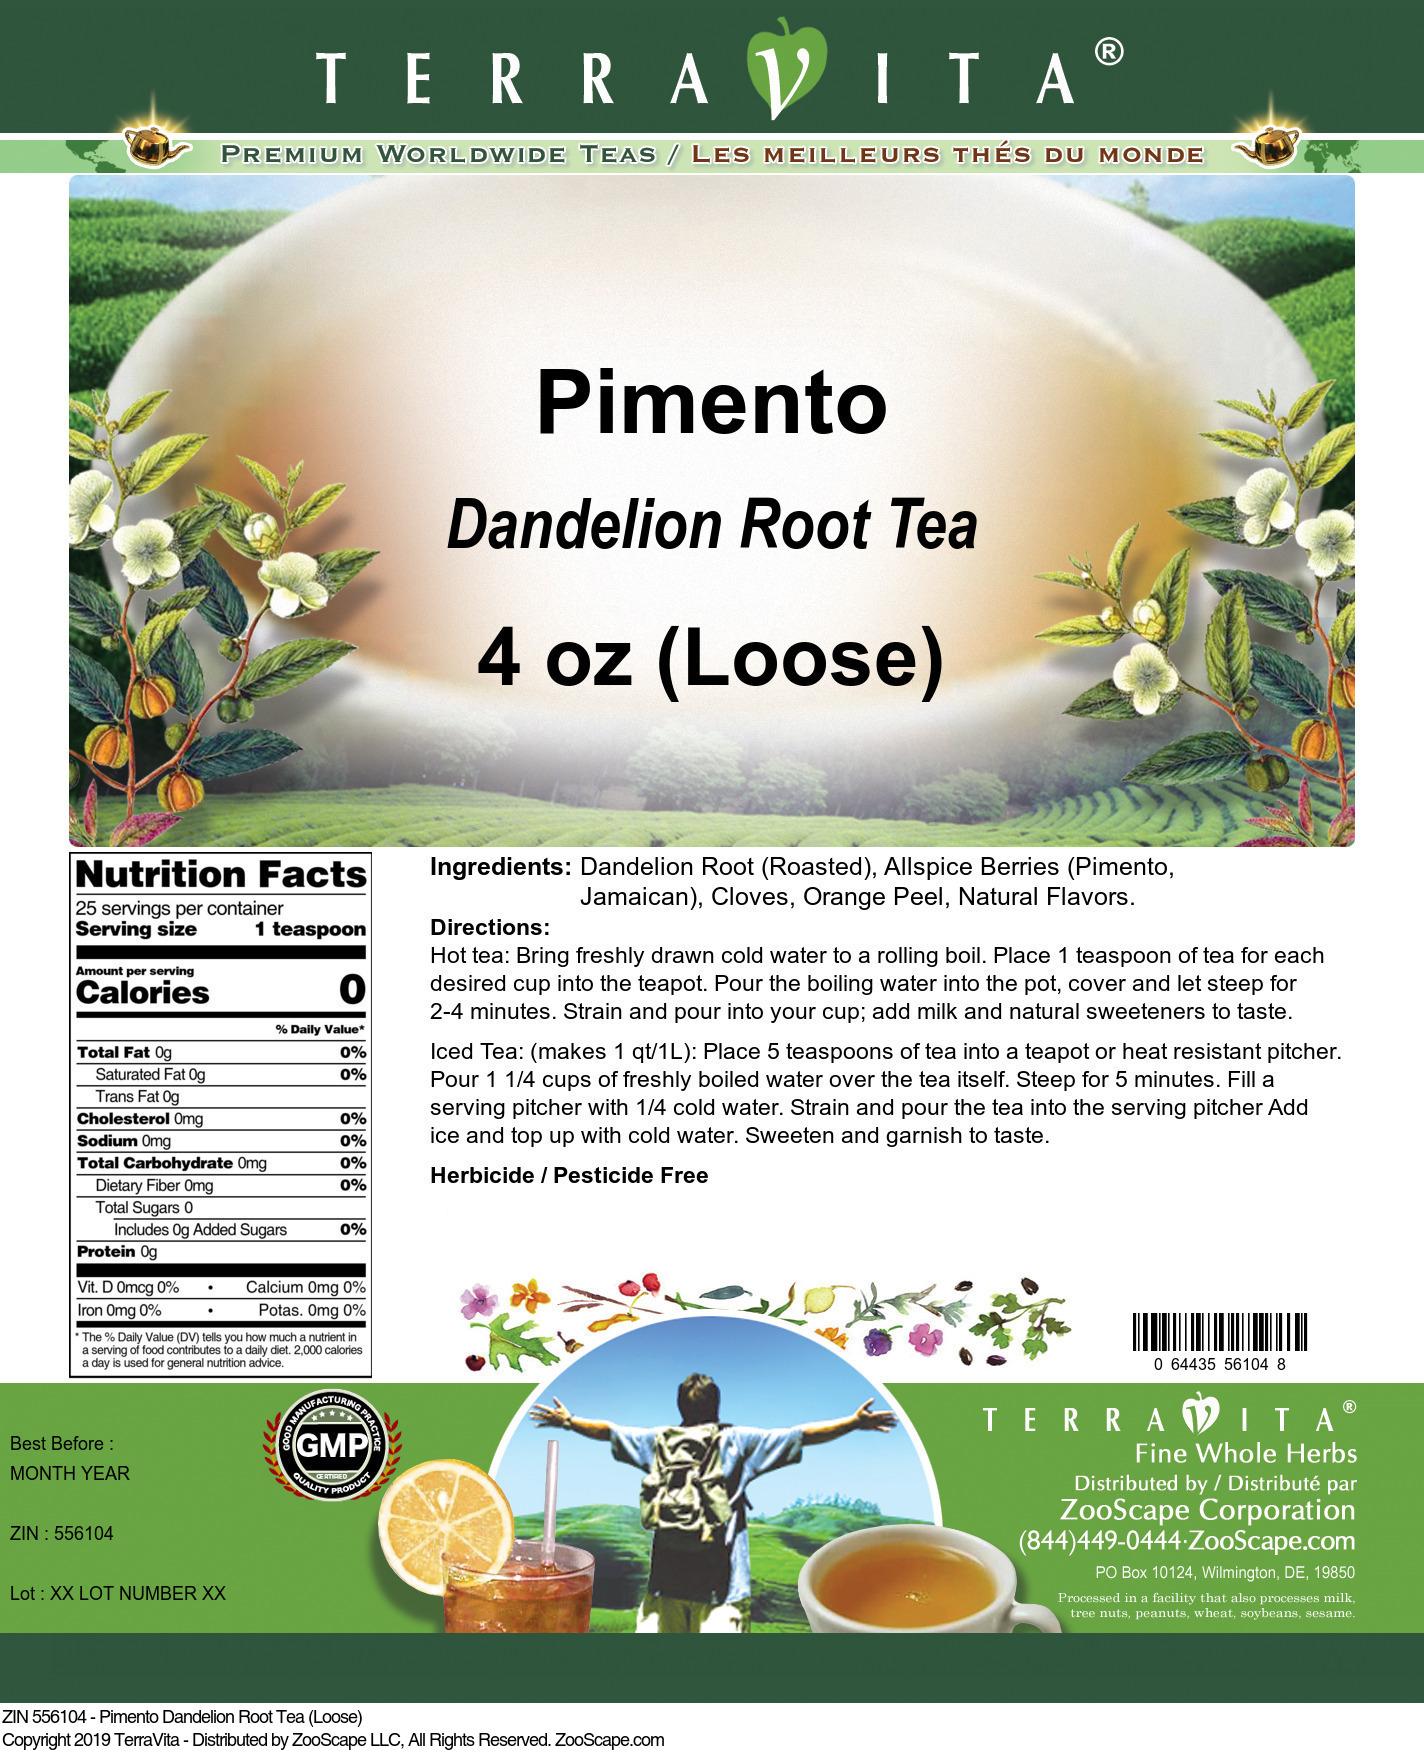 Pimento Dandelion Root Tea (Loose)